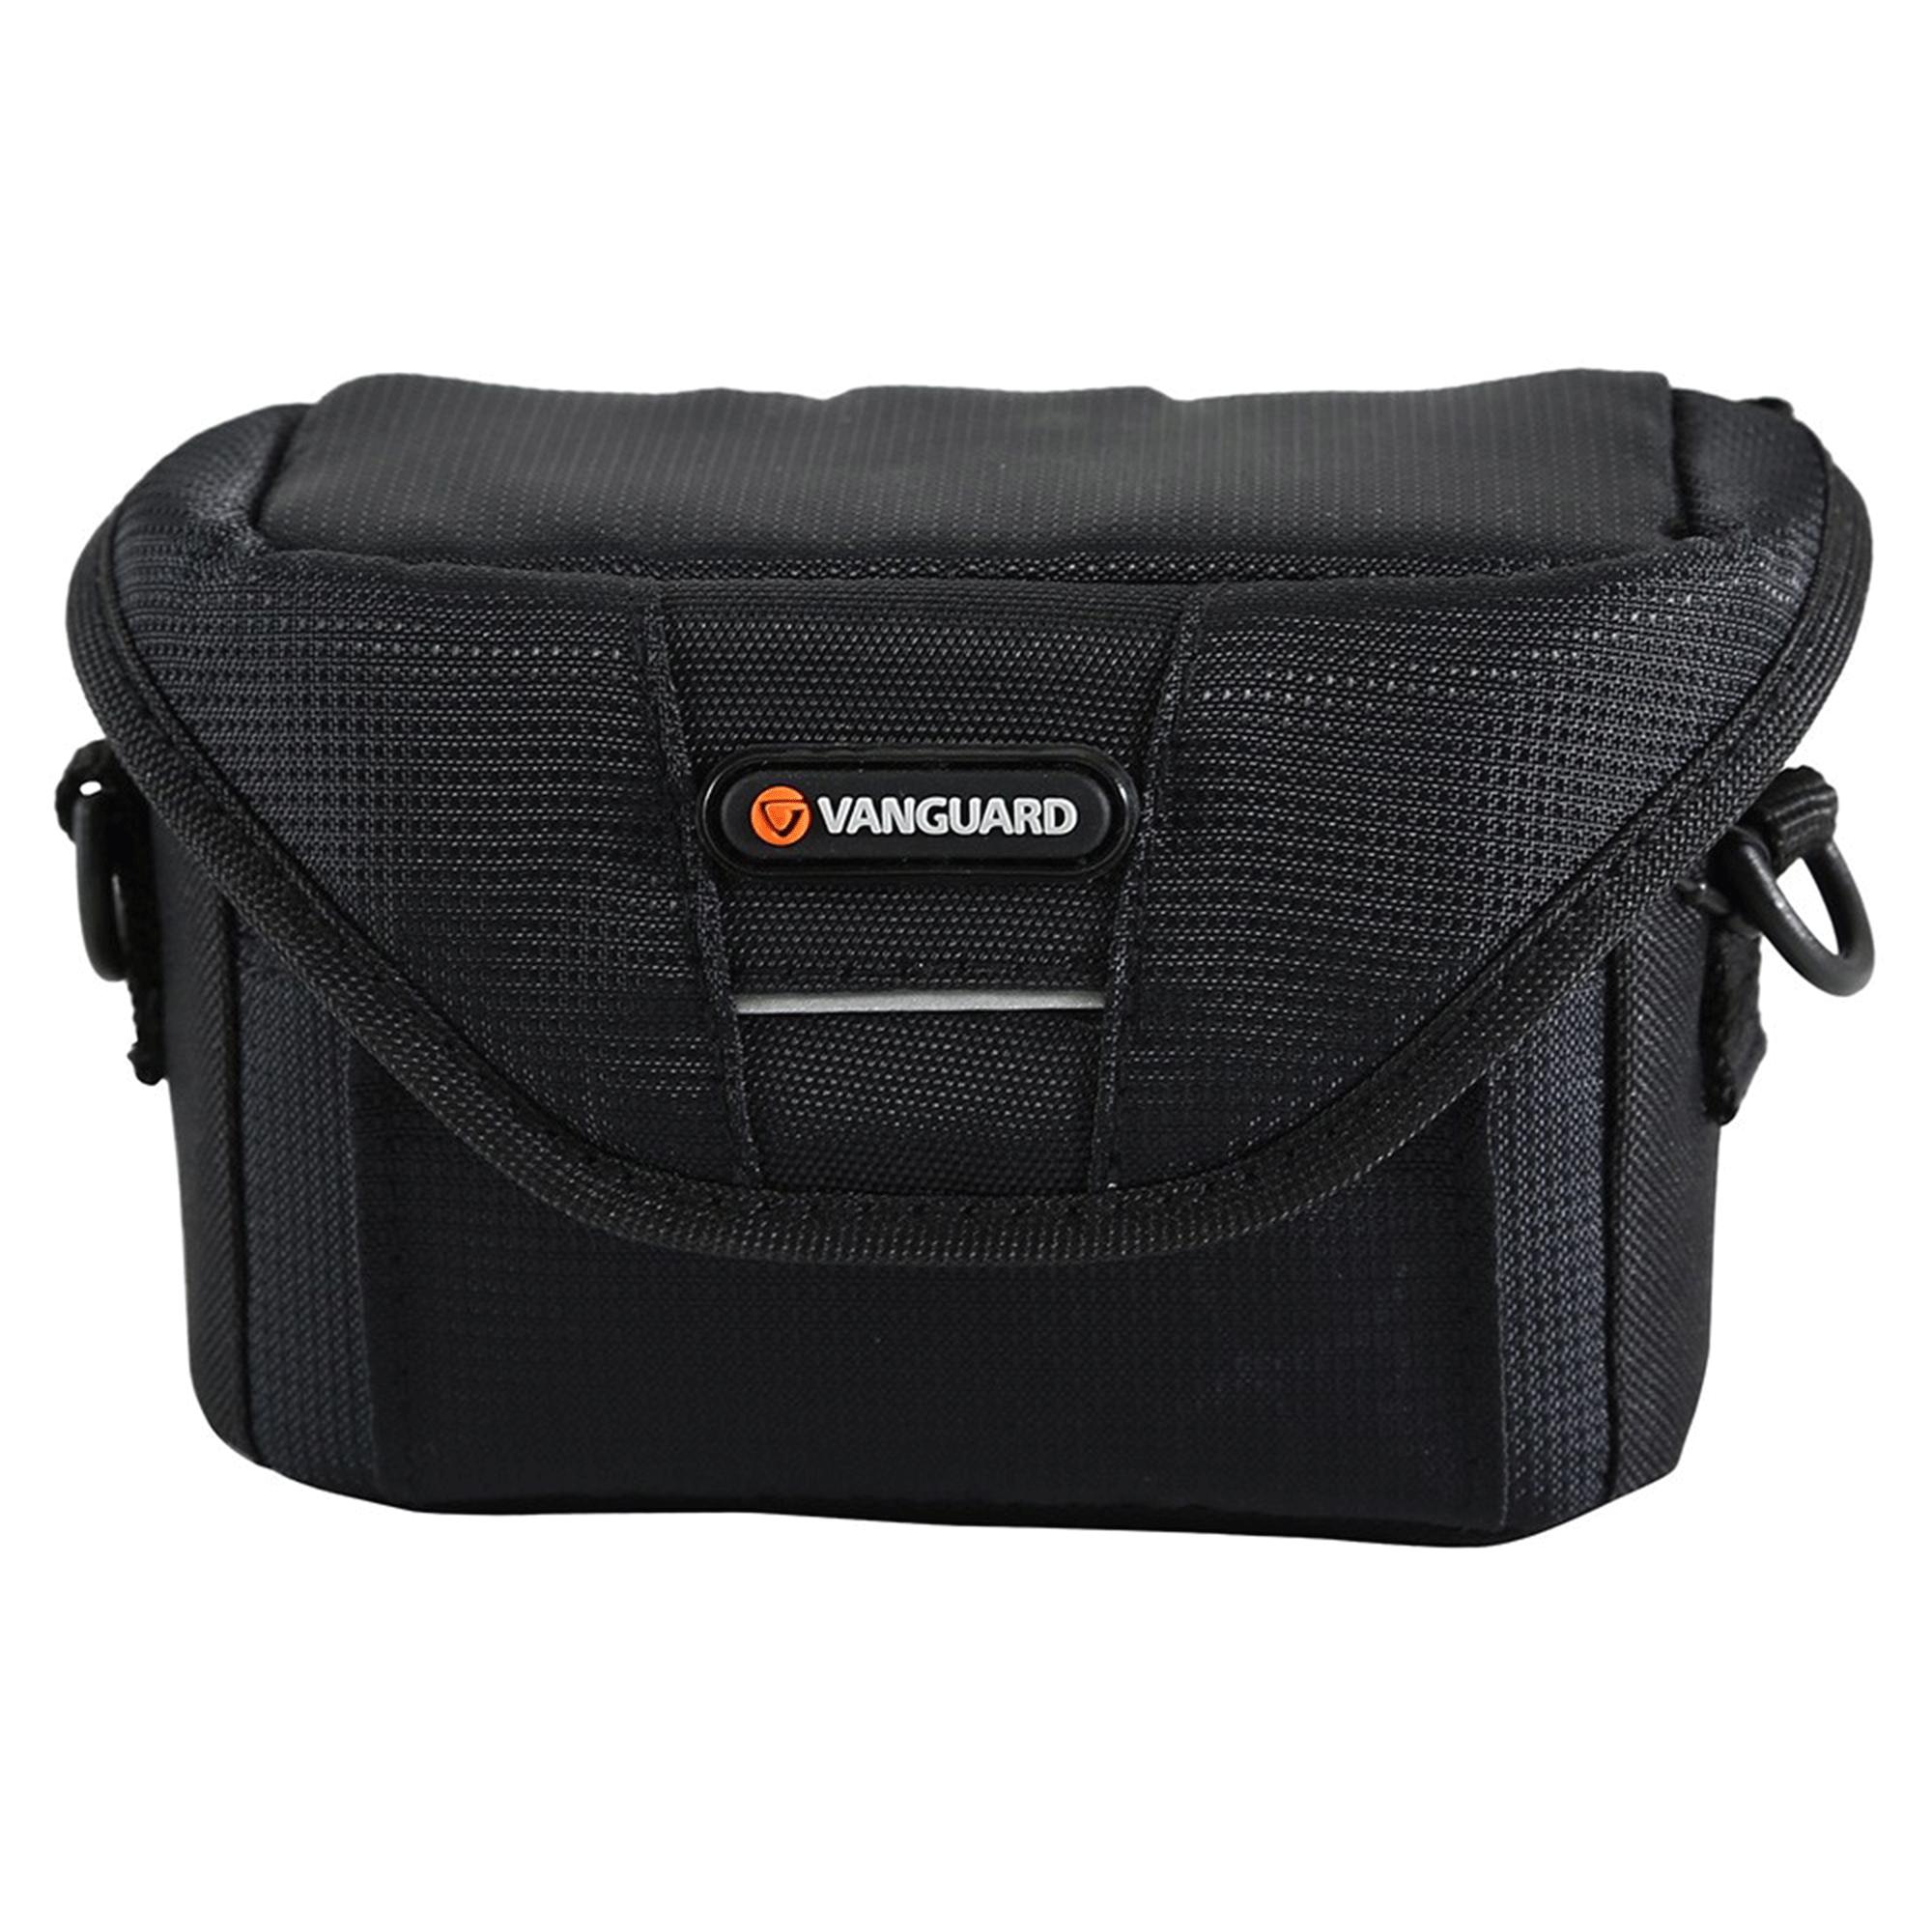 Vanguard BIIN II 7H pouch